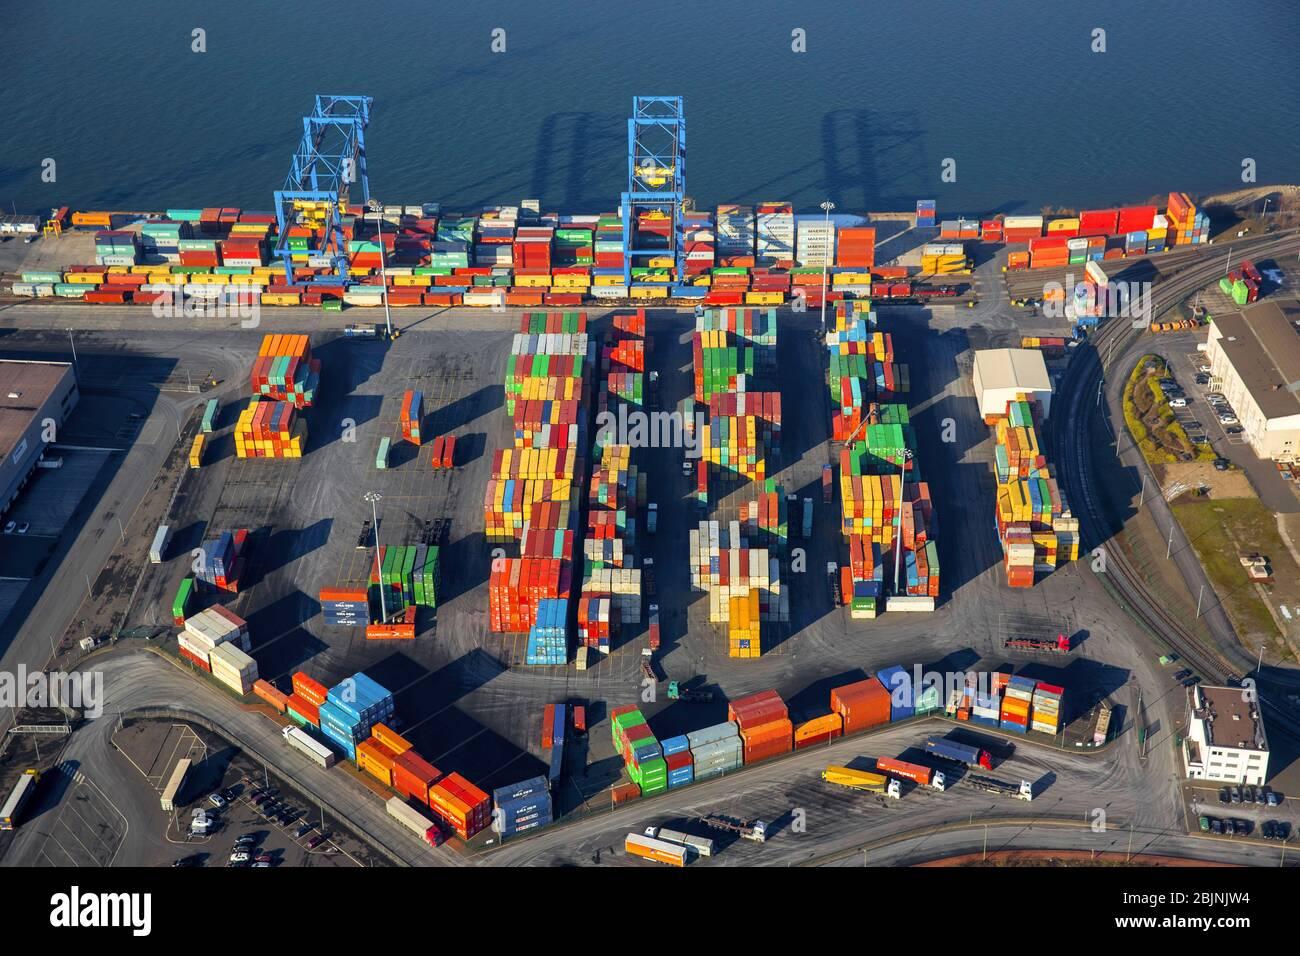 Terminal de contenedores en el puerto interior del puerto Rhein-Ruhr Terminal Gesellschaft fuer Container- und Gueterumschlag mbH Richard-Seiffert-Strasse en Duisburg-Wanheim-, 26.01.2017, vista aérea, Alemania, Renania del Norte-Westfalia, Ruhr Area, Duisburg Foto de stock